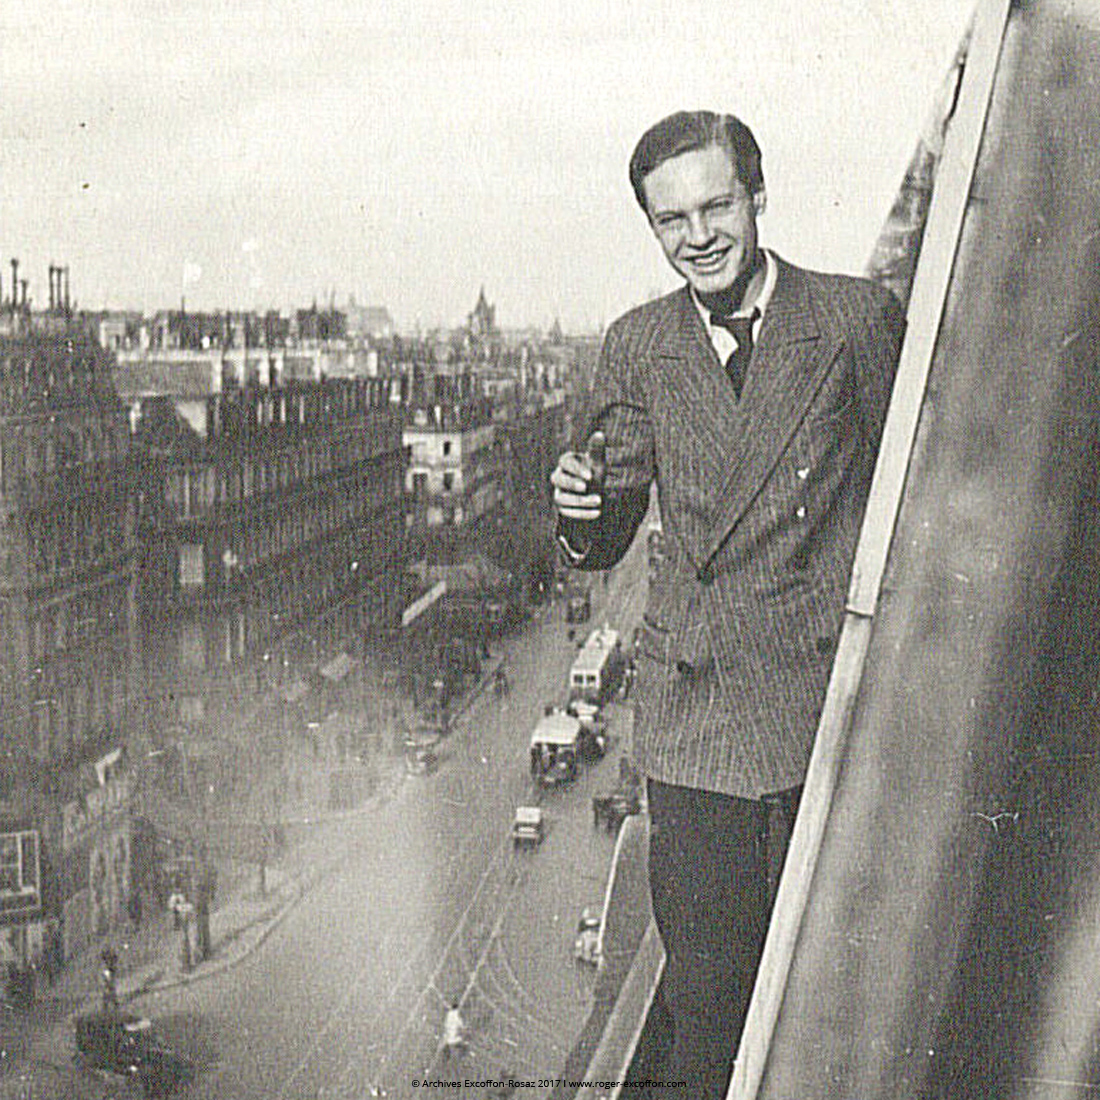 Roger Excoffon 1930 portrait photo